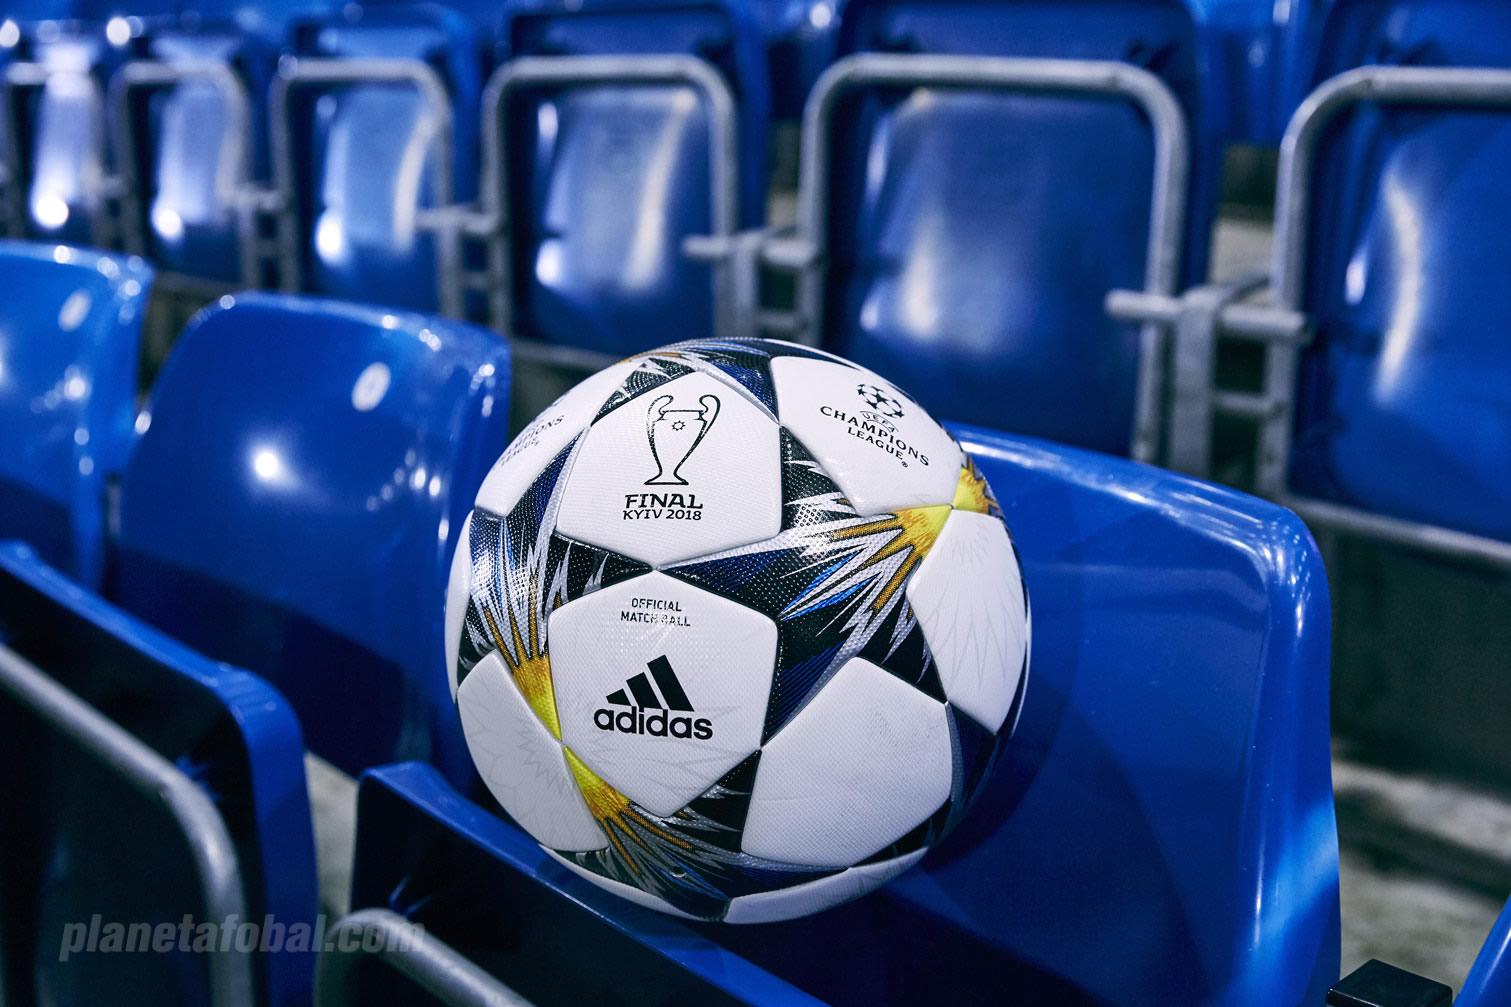 Balón oficial UCL Final Kiev 2018 | Foto Adidas